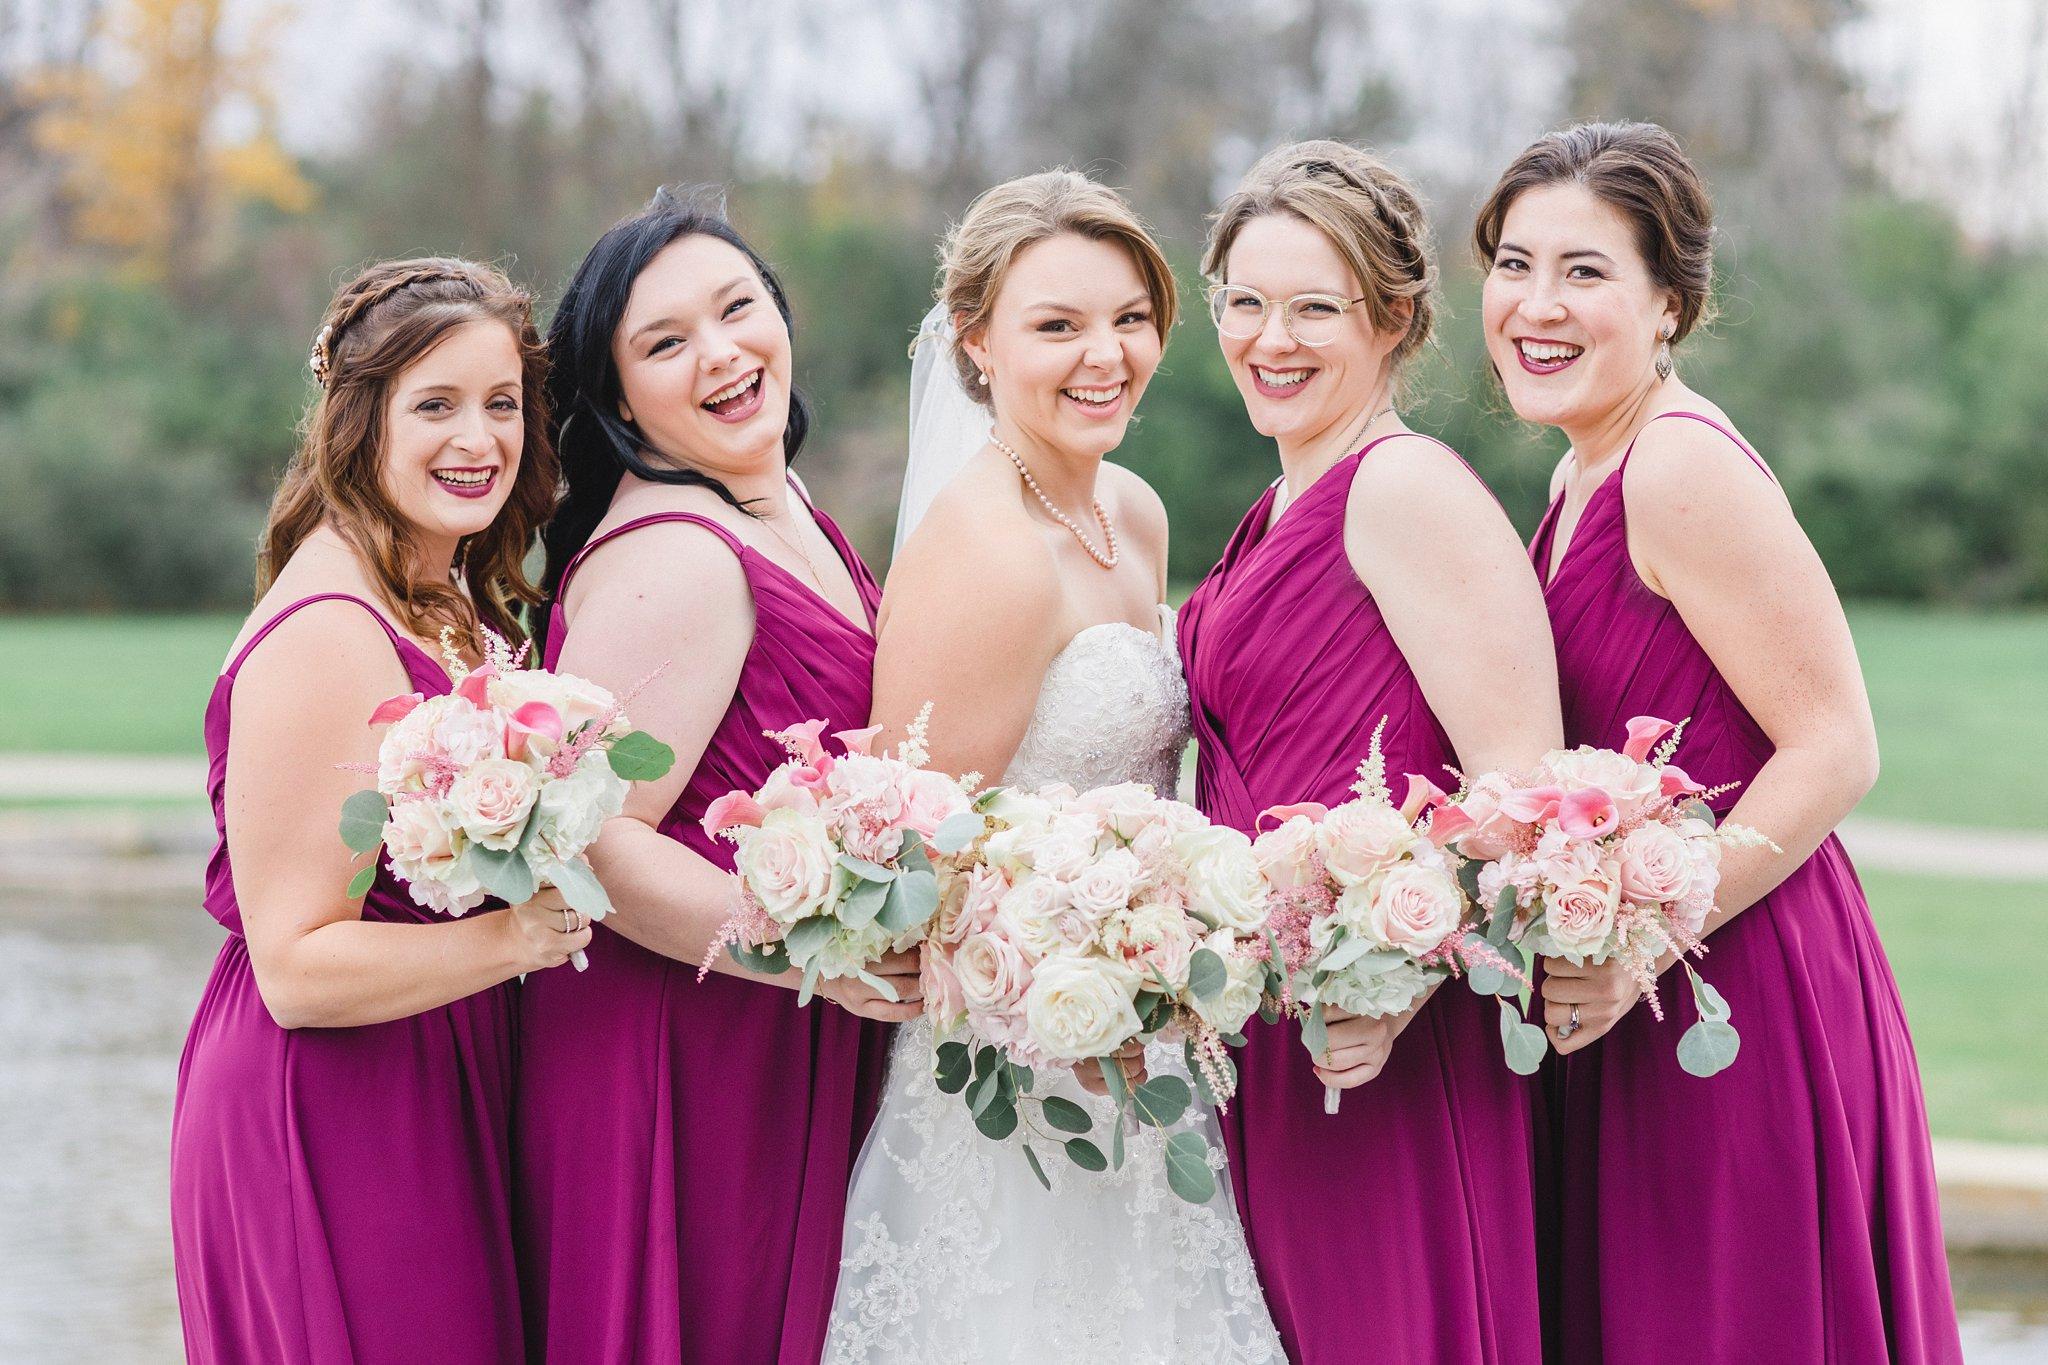 Fuchsia and blush club de golf gatineau wedding amy pinder a dark lip colour to match their fuchsia bridesmaid dresses looking fierce ladies ombrellifo Choice Image